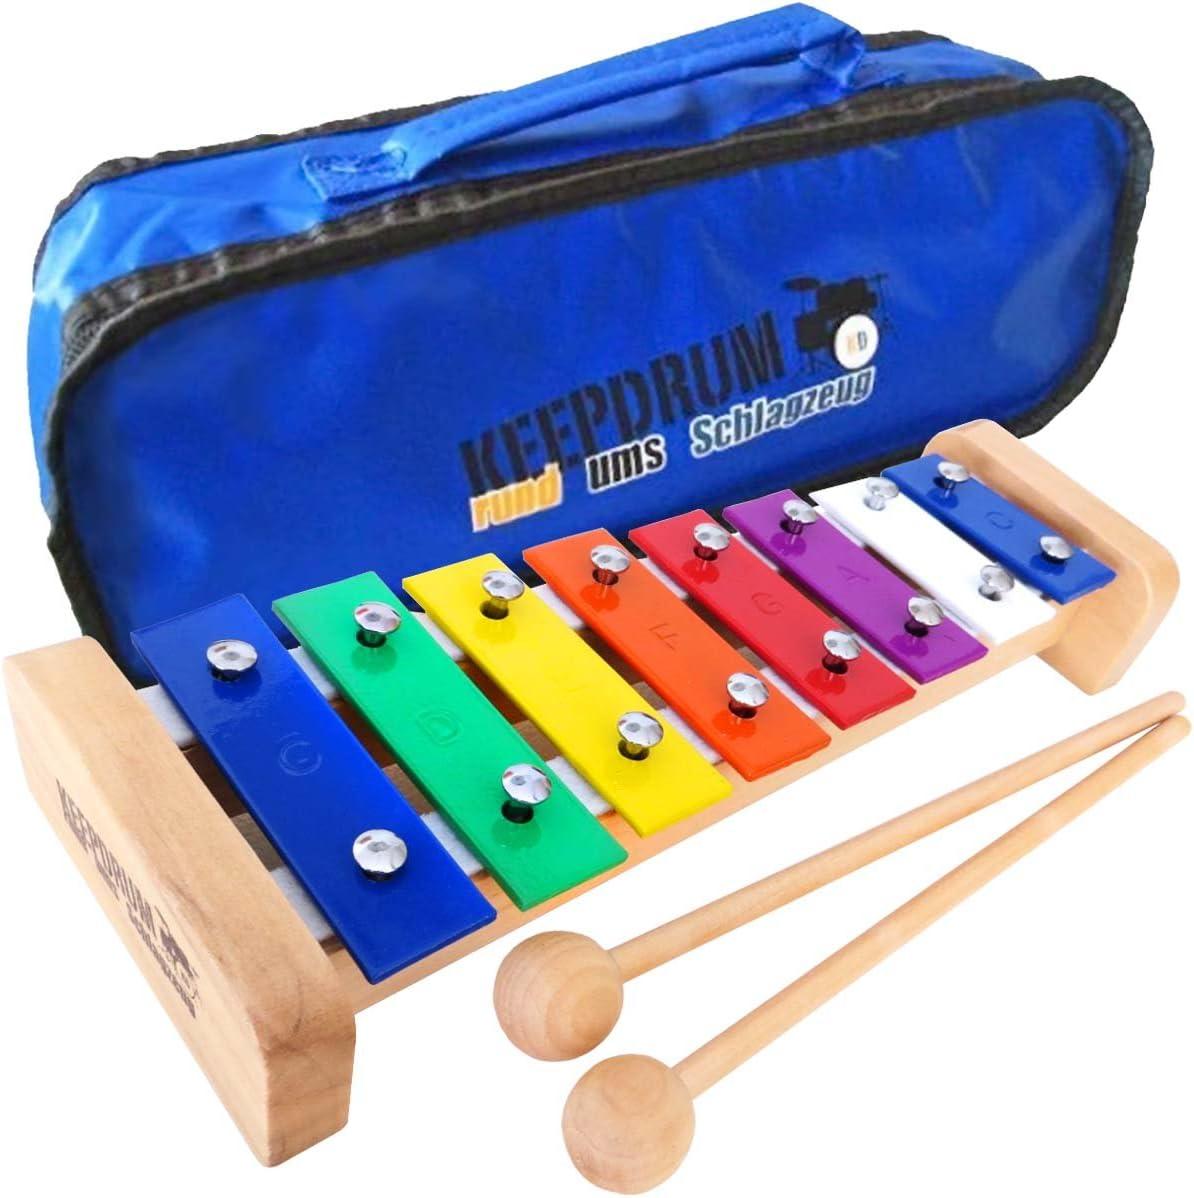 keepdrum KGS1 Glockenspiel aus Holz Xylophon Tragetasche MB01